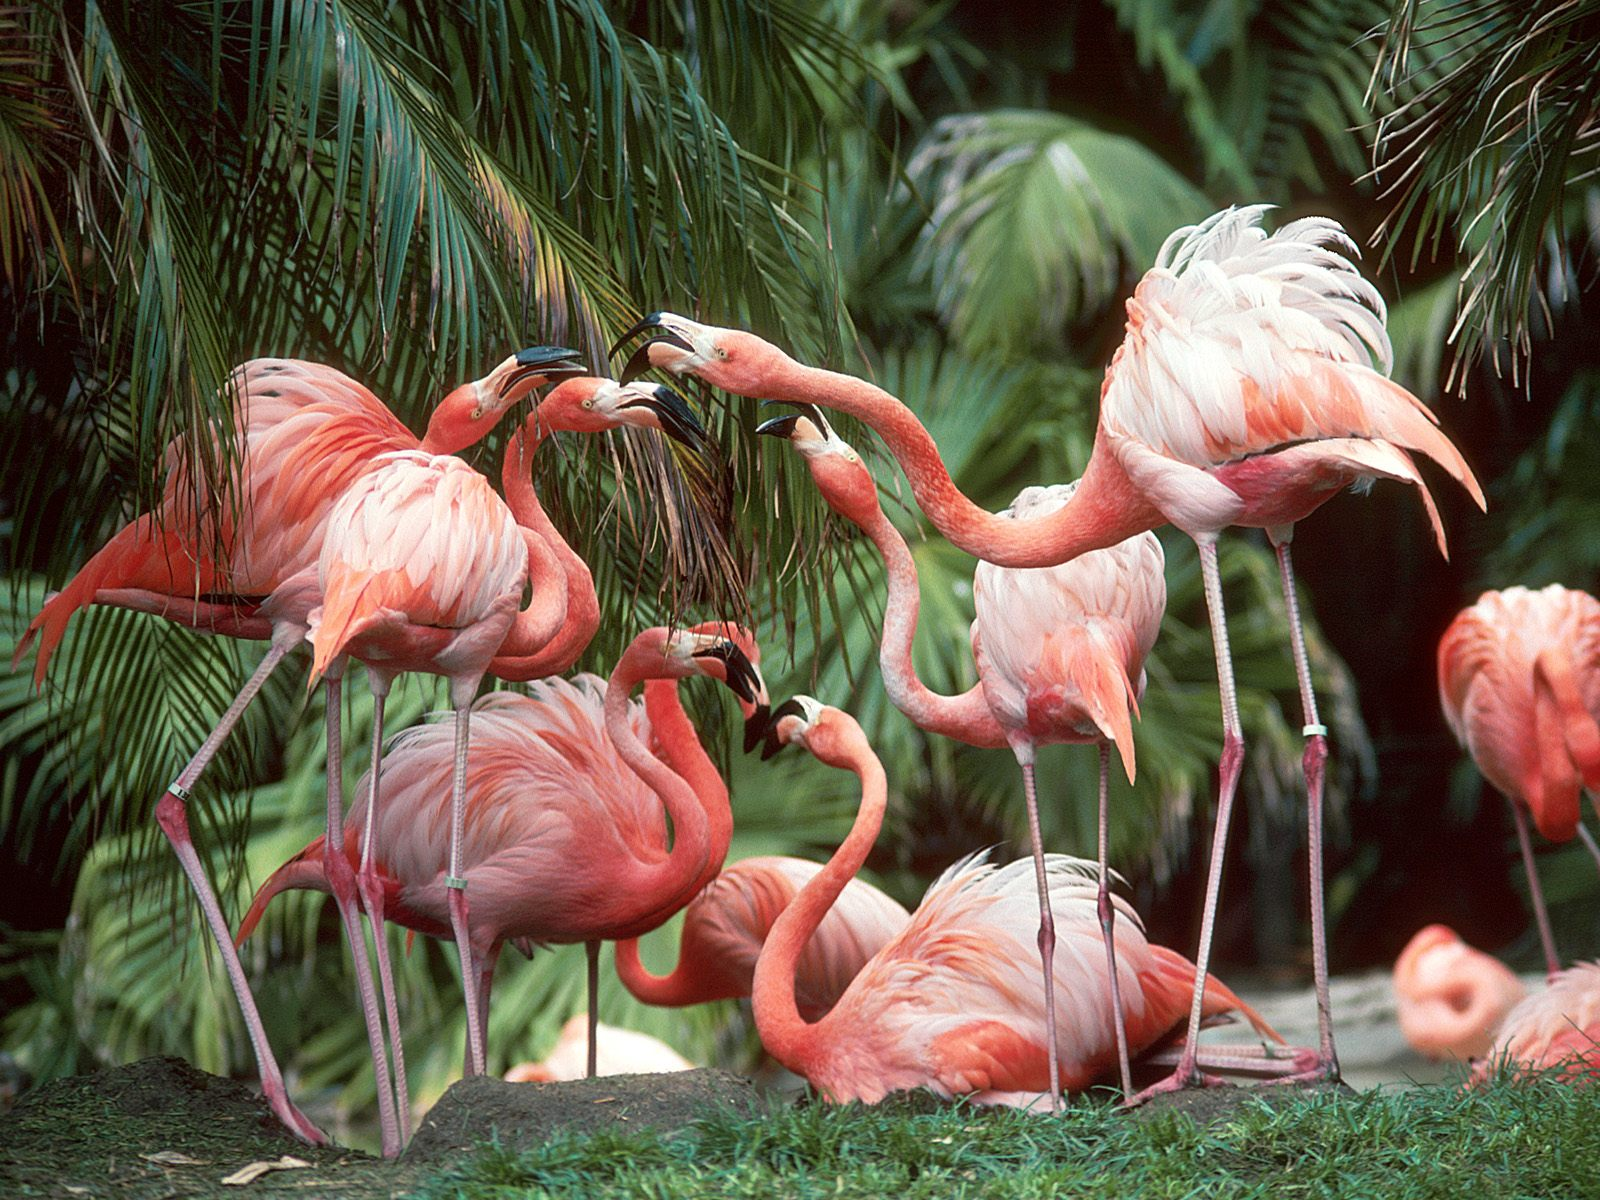 http://1.bp.blogspot.com/-QxQNdFEhiII/UEIShuBdNkI/AAAAAAAAB8c/OrikxLPOgL4/s1600/free-bird-wallpaper-1600x1200-0065.jpg